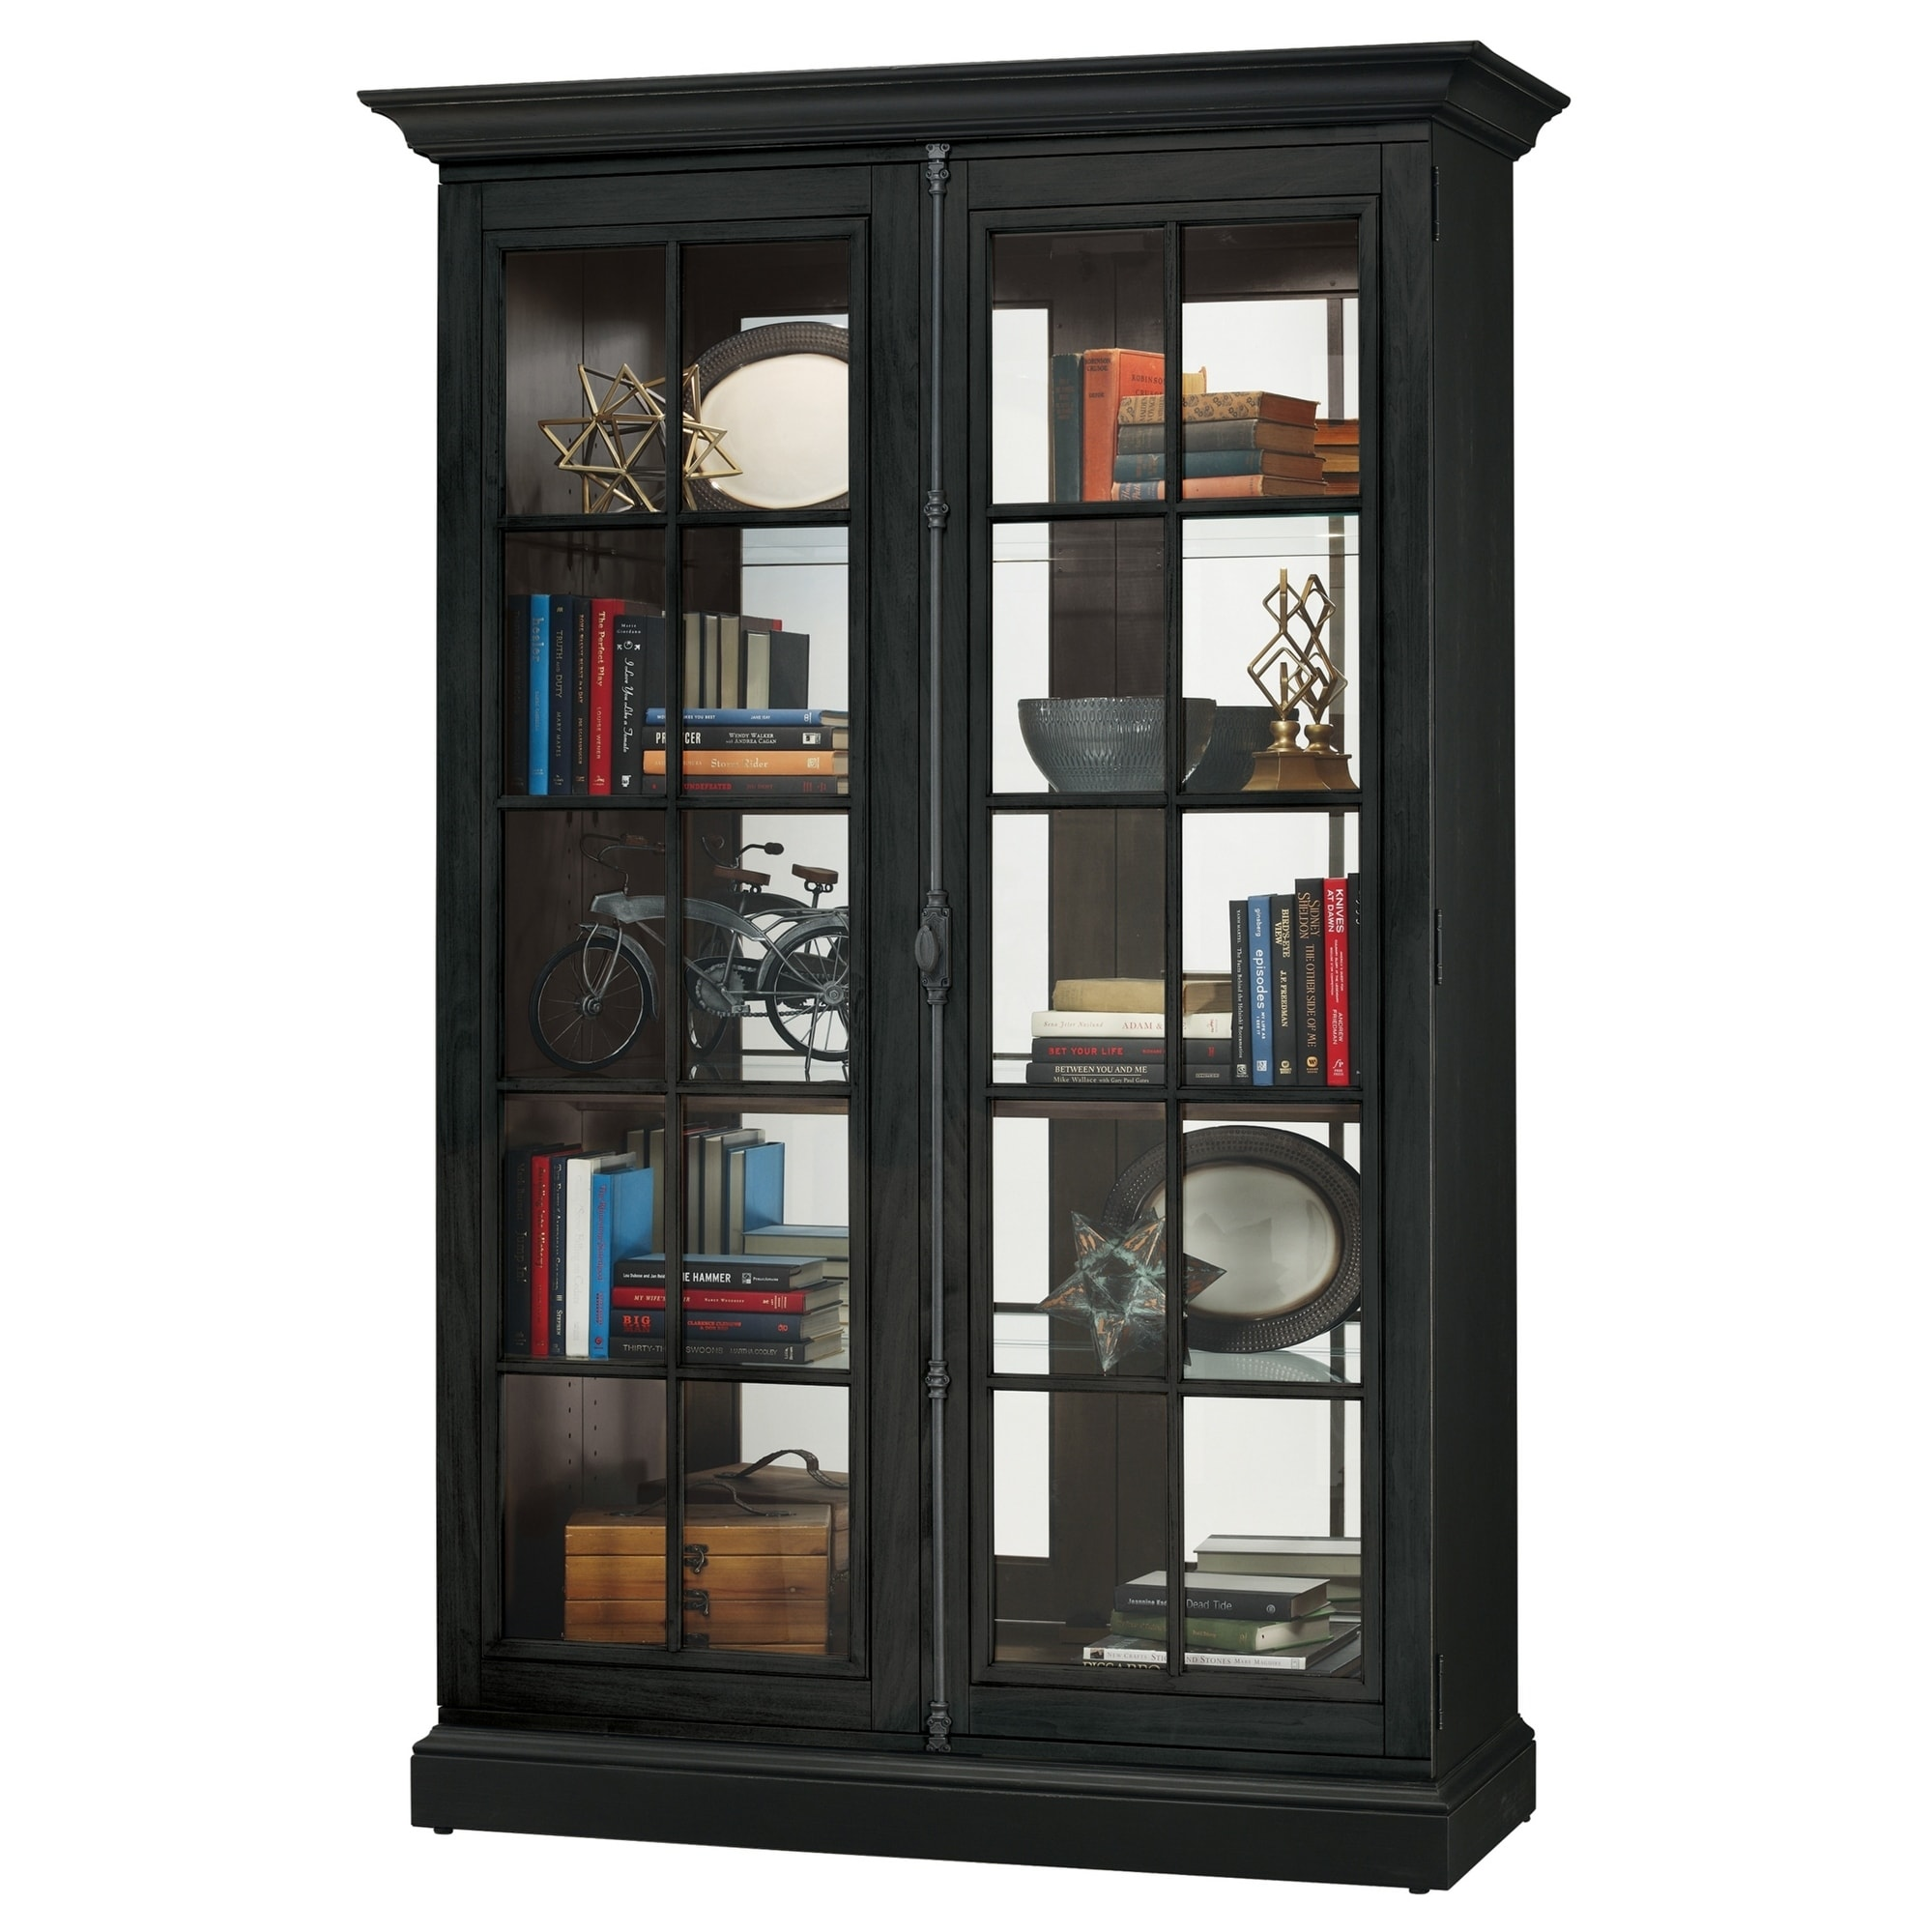 Howard Miller Clawson IV Rich Black Wood Farmhouse Chic Tall 5-shelf Living  Room Curio Cabinet